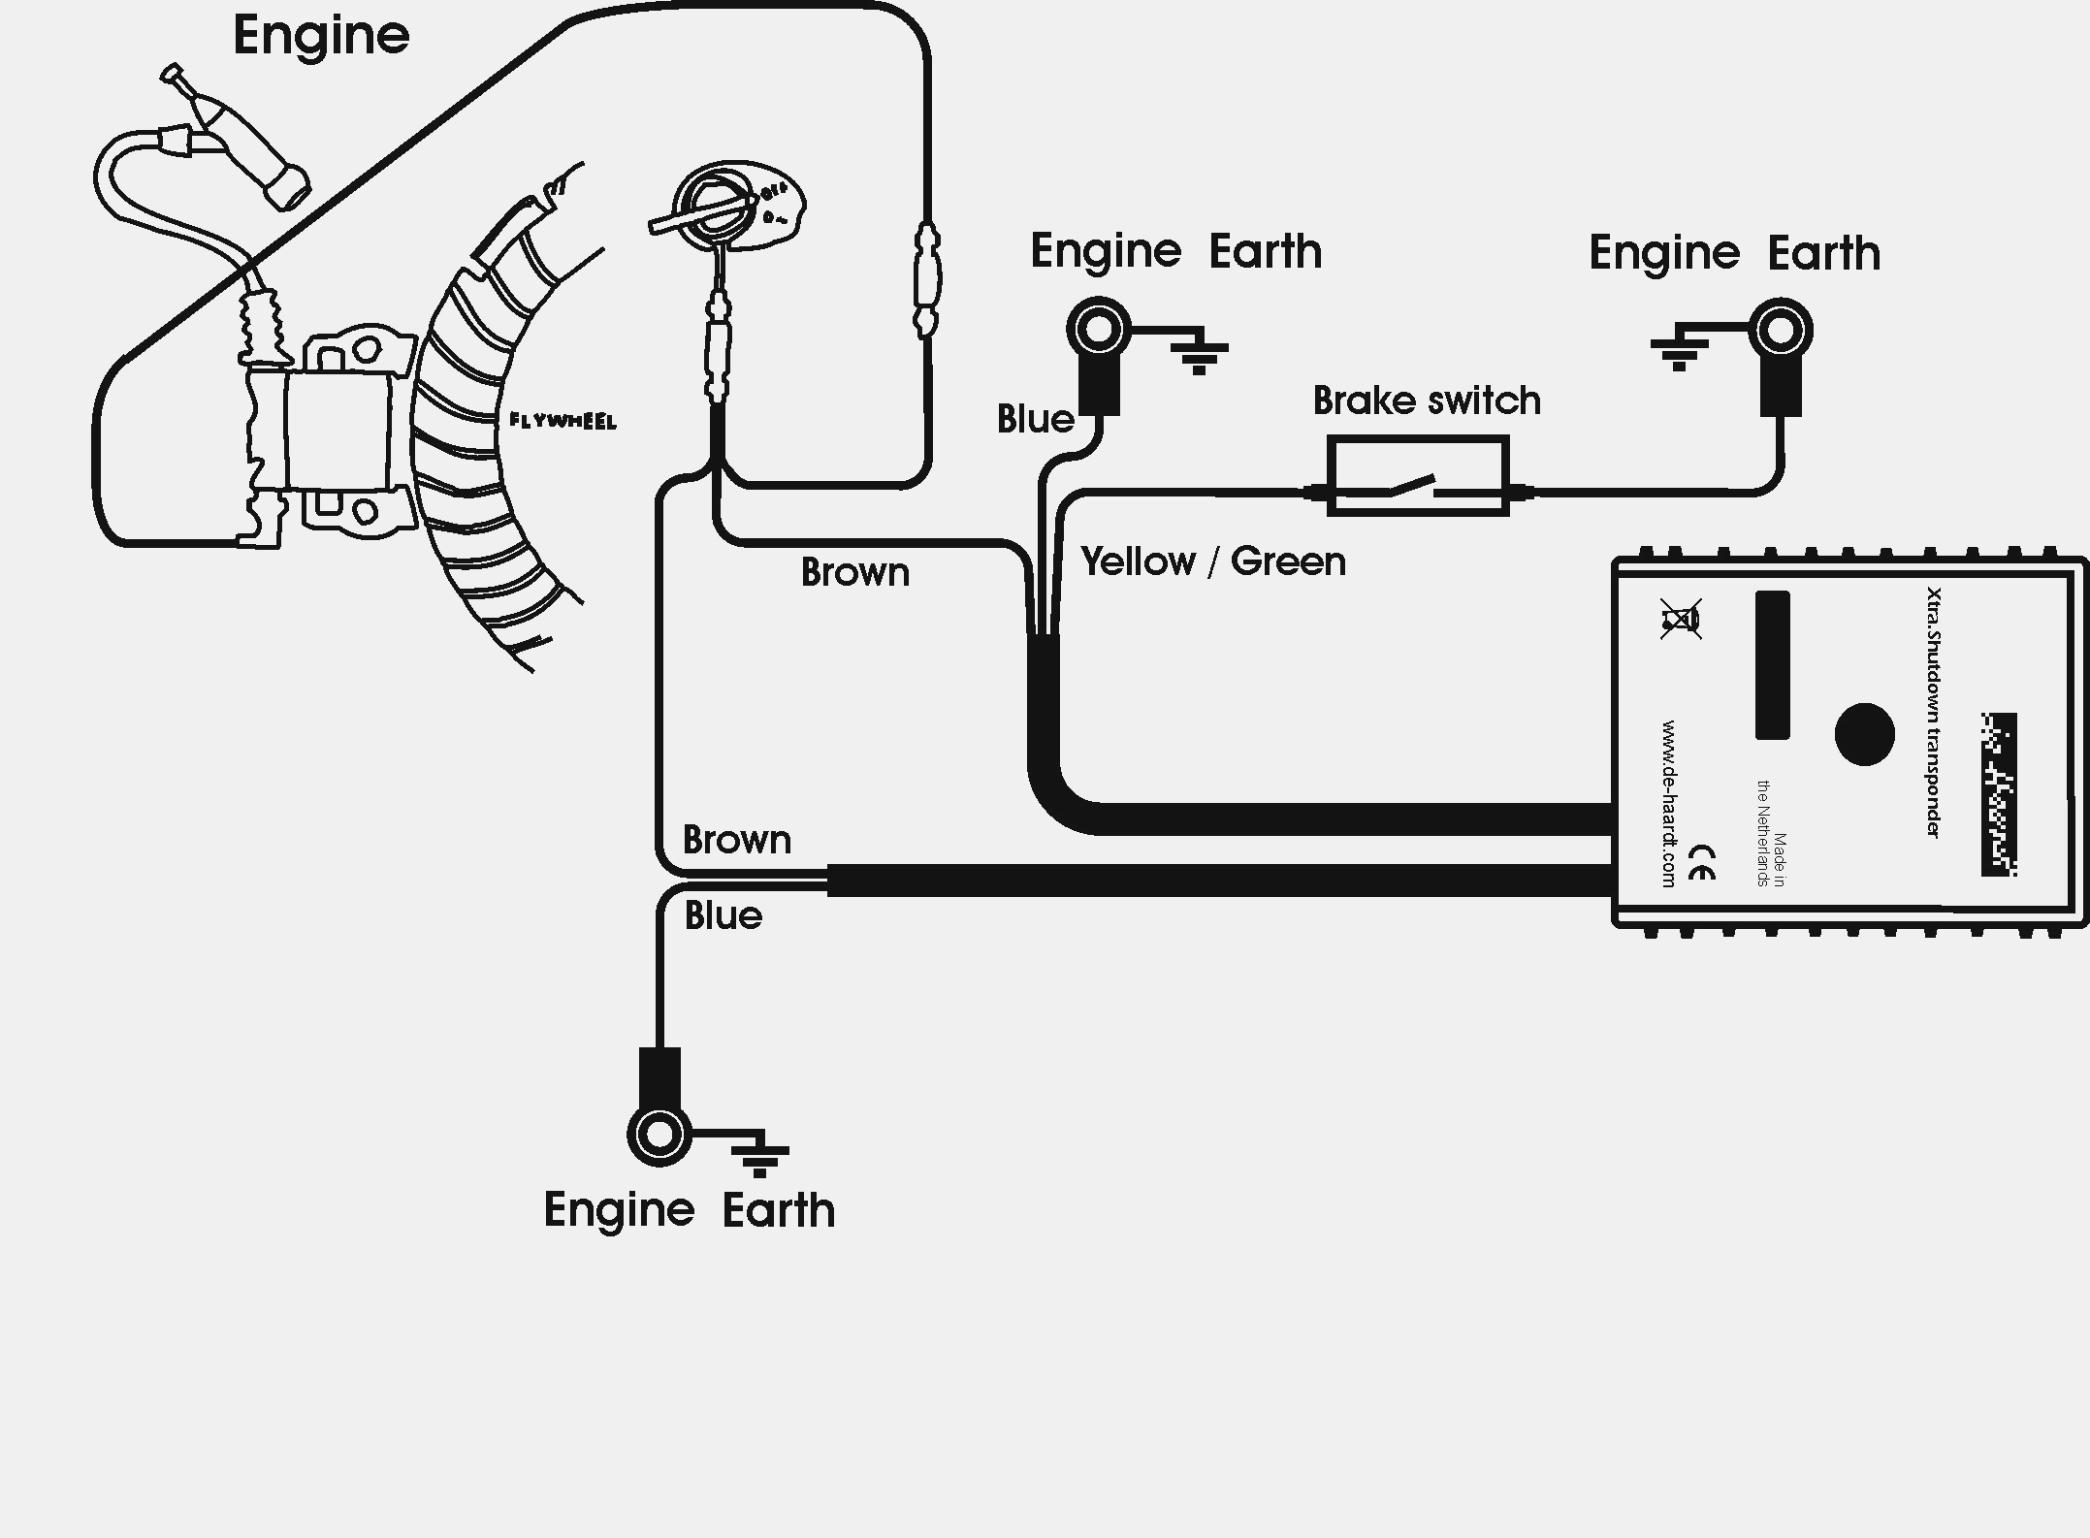 Honda Gx670 Wiring Harness - Wiring Diagram Write